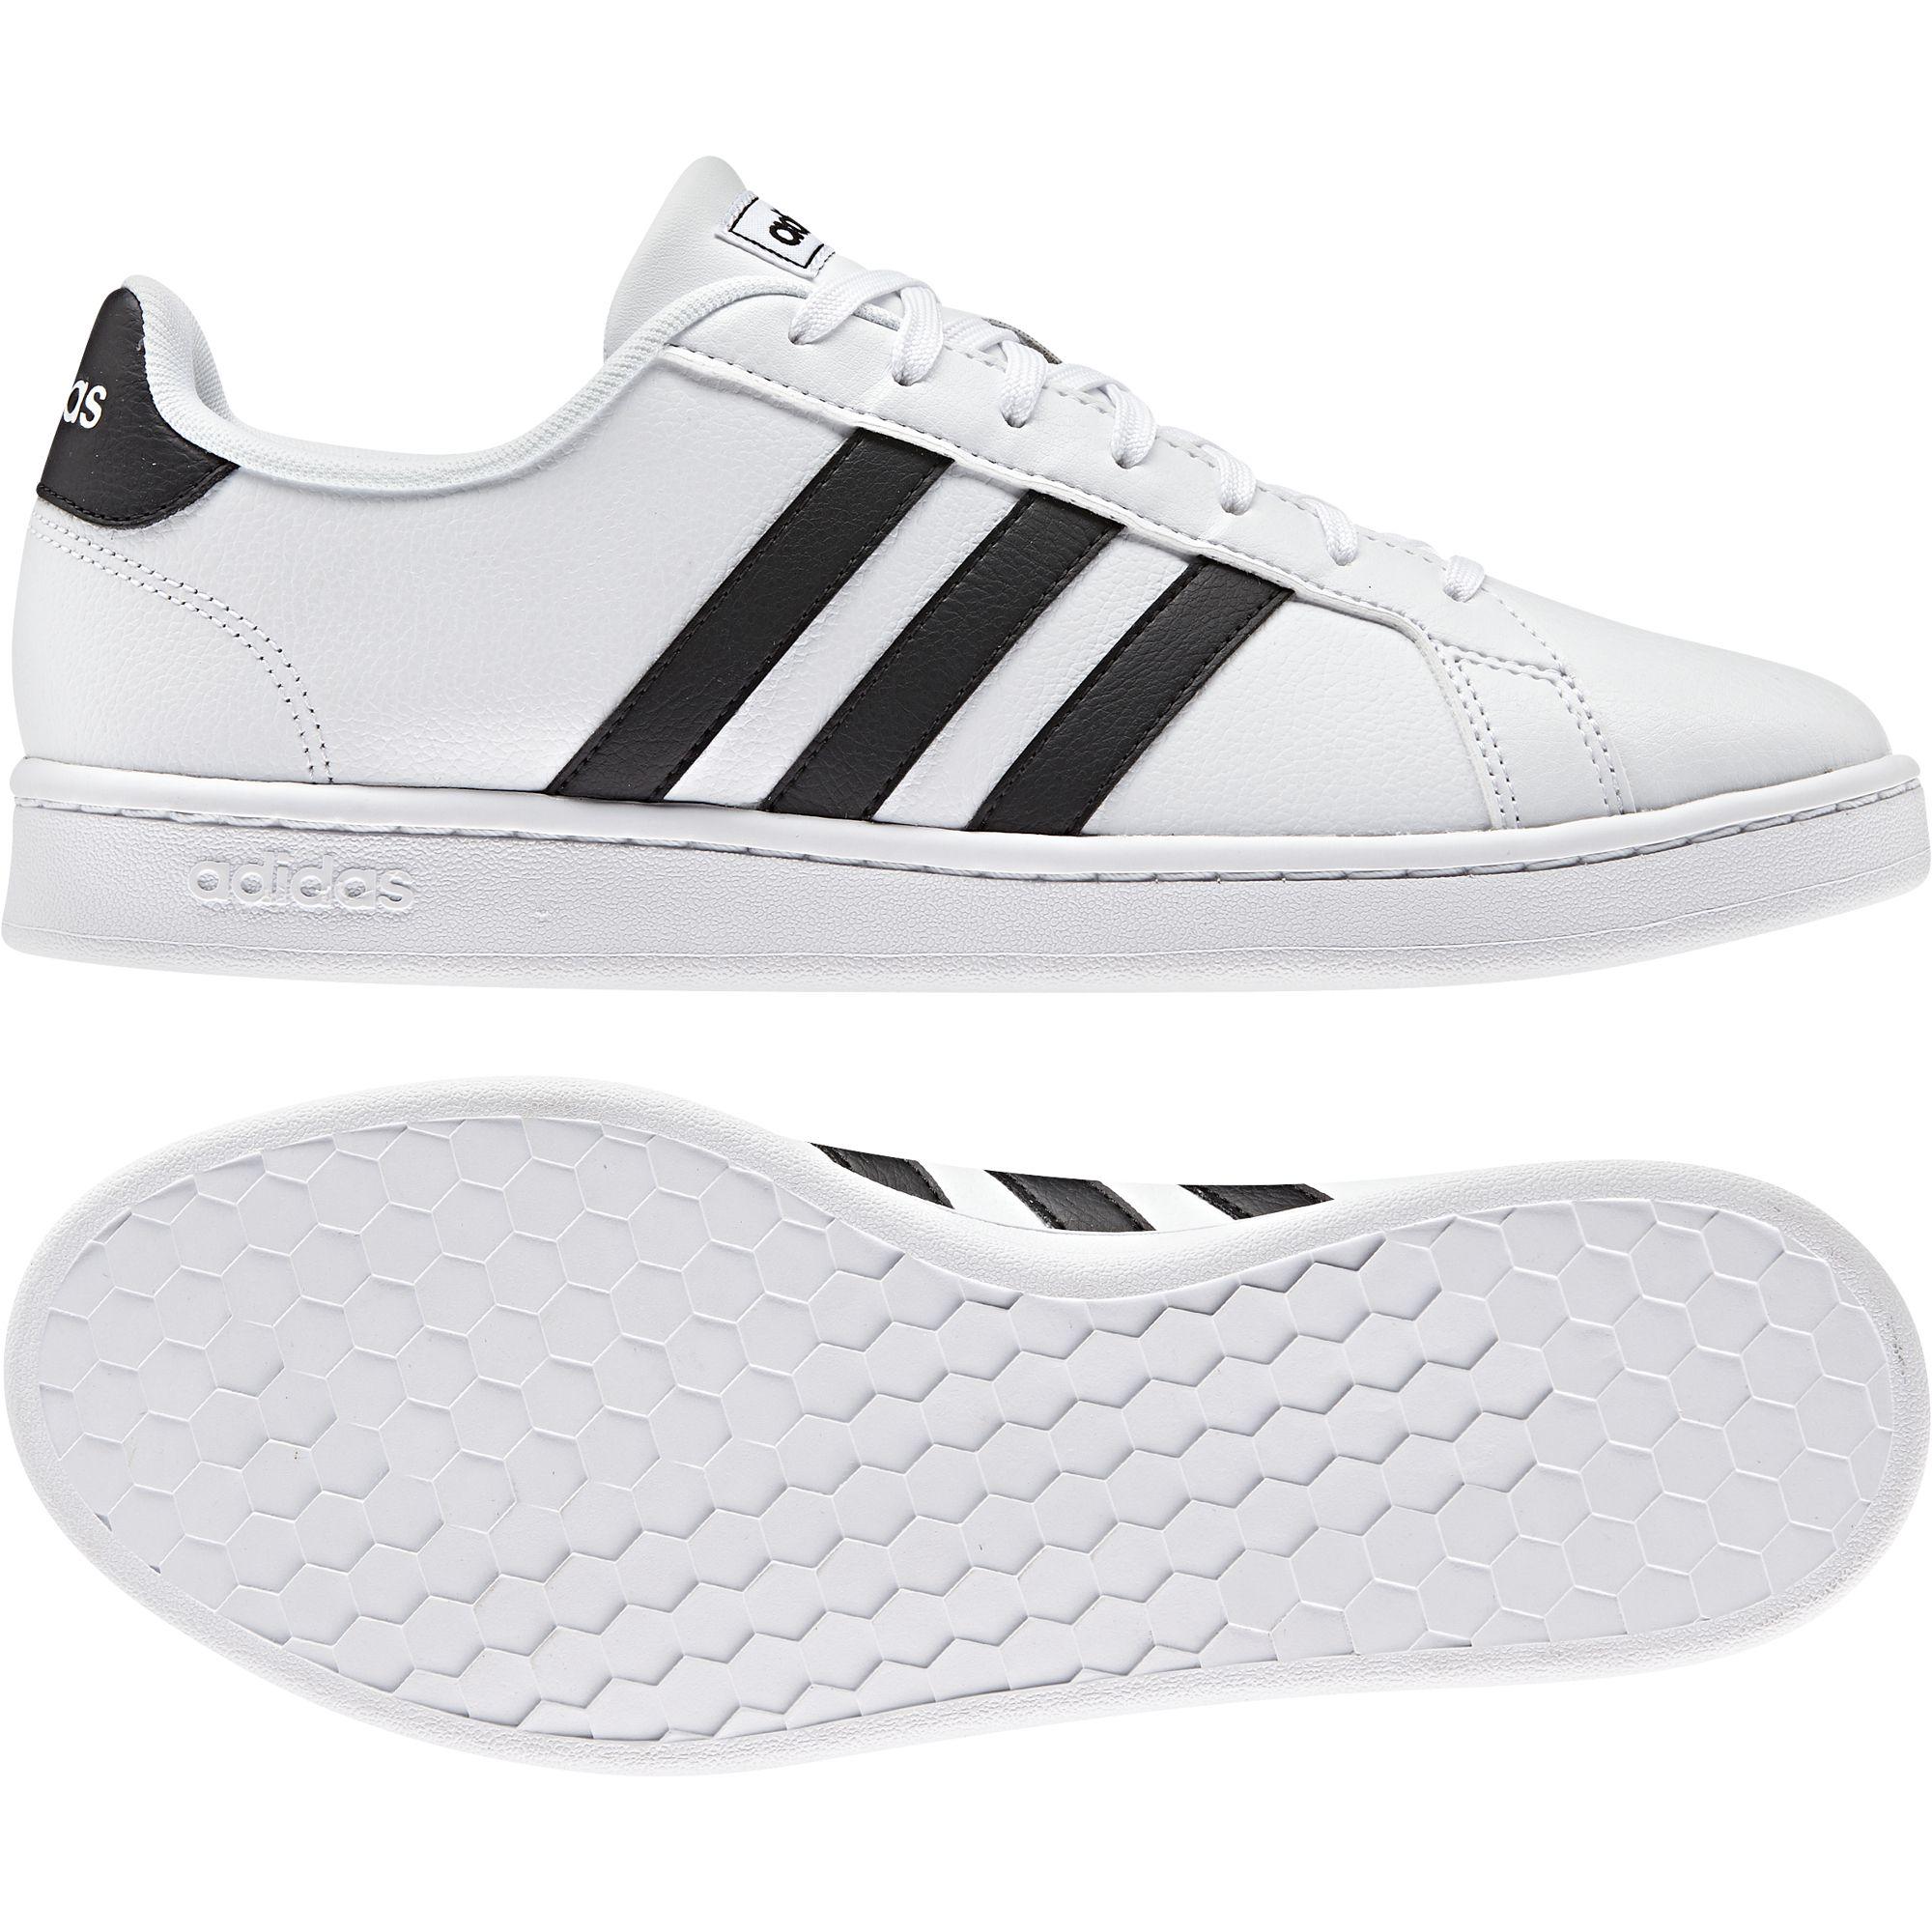 6e06cebdb0 Adidas férfi cipő GRAND COURT   Markasbolt.hu Hivatalos ADIDAS ...